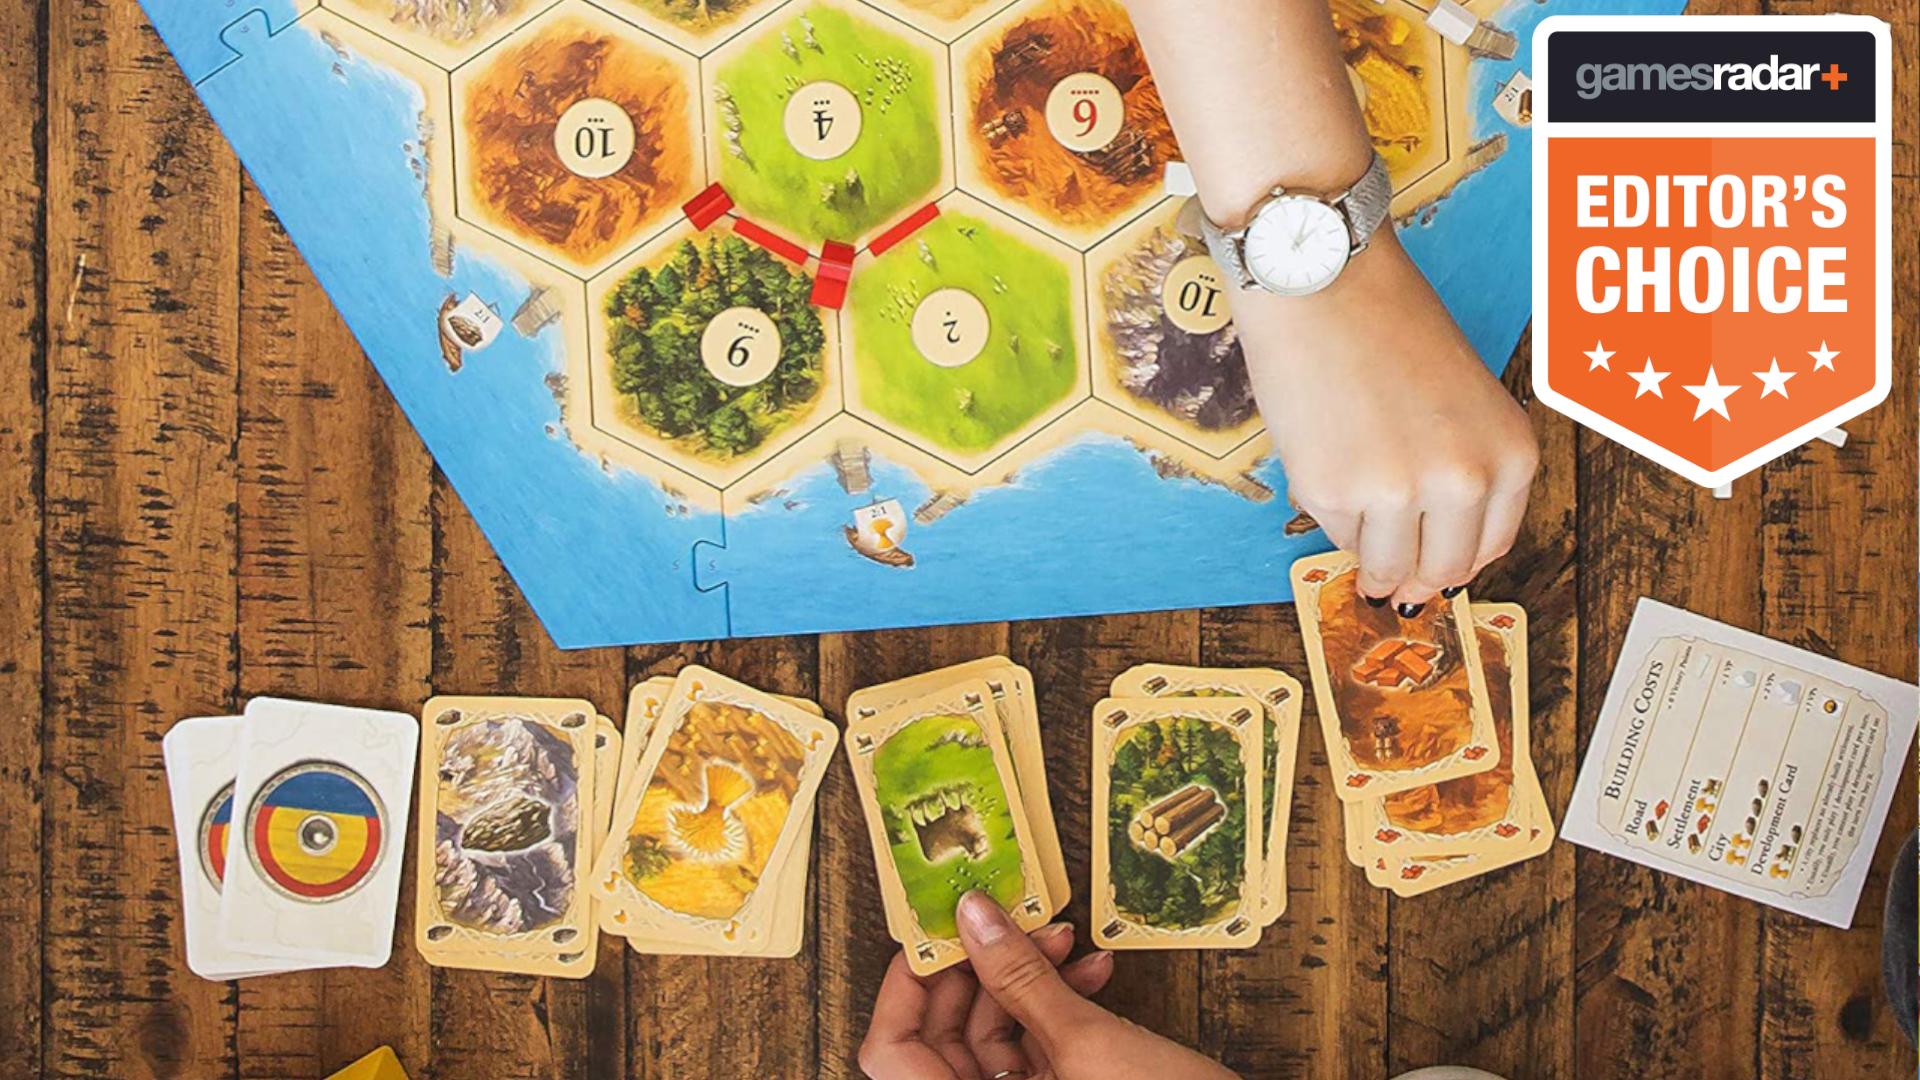 Board Game Creative Fortnite Best Classic Board Games Revisit Some Old Favorites In 2021 Gamesradar